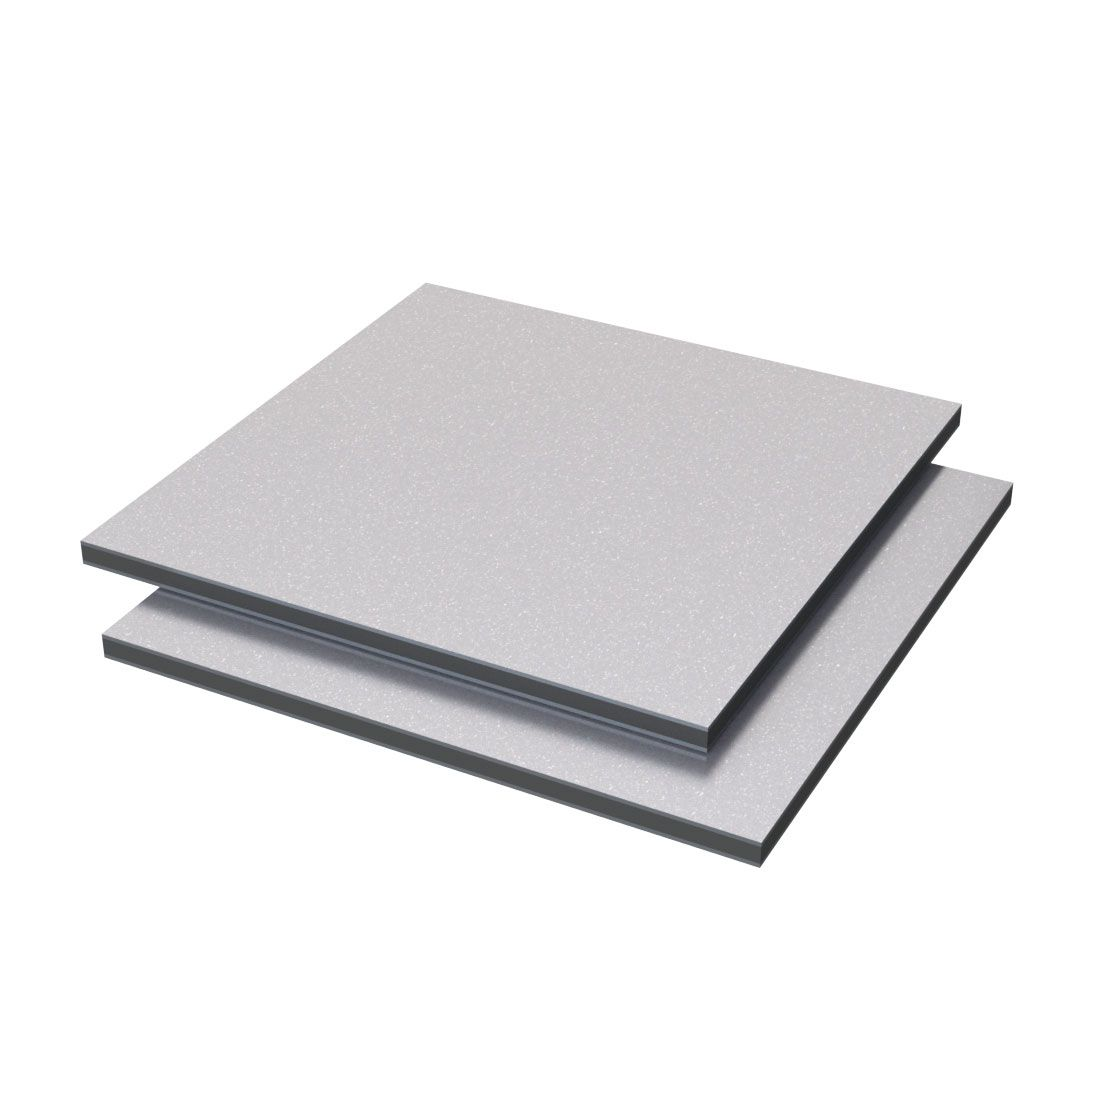 Etalbond Aluminium /PE FR Zilver Metallic 102 4050x1500x4mm Pvdf2 gecoat